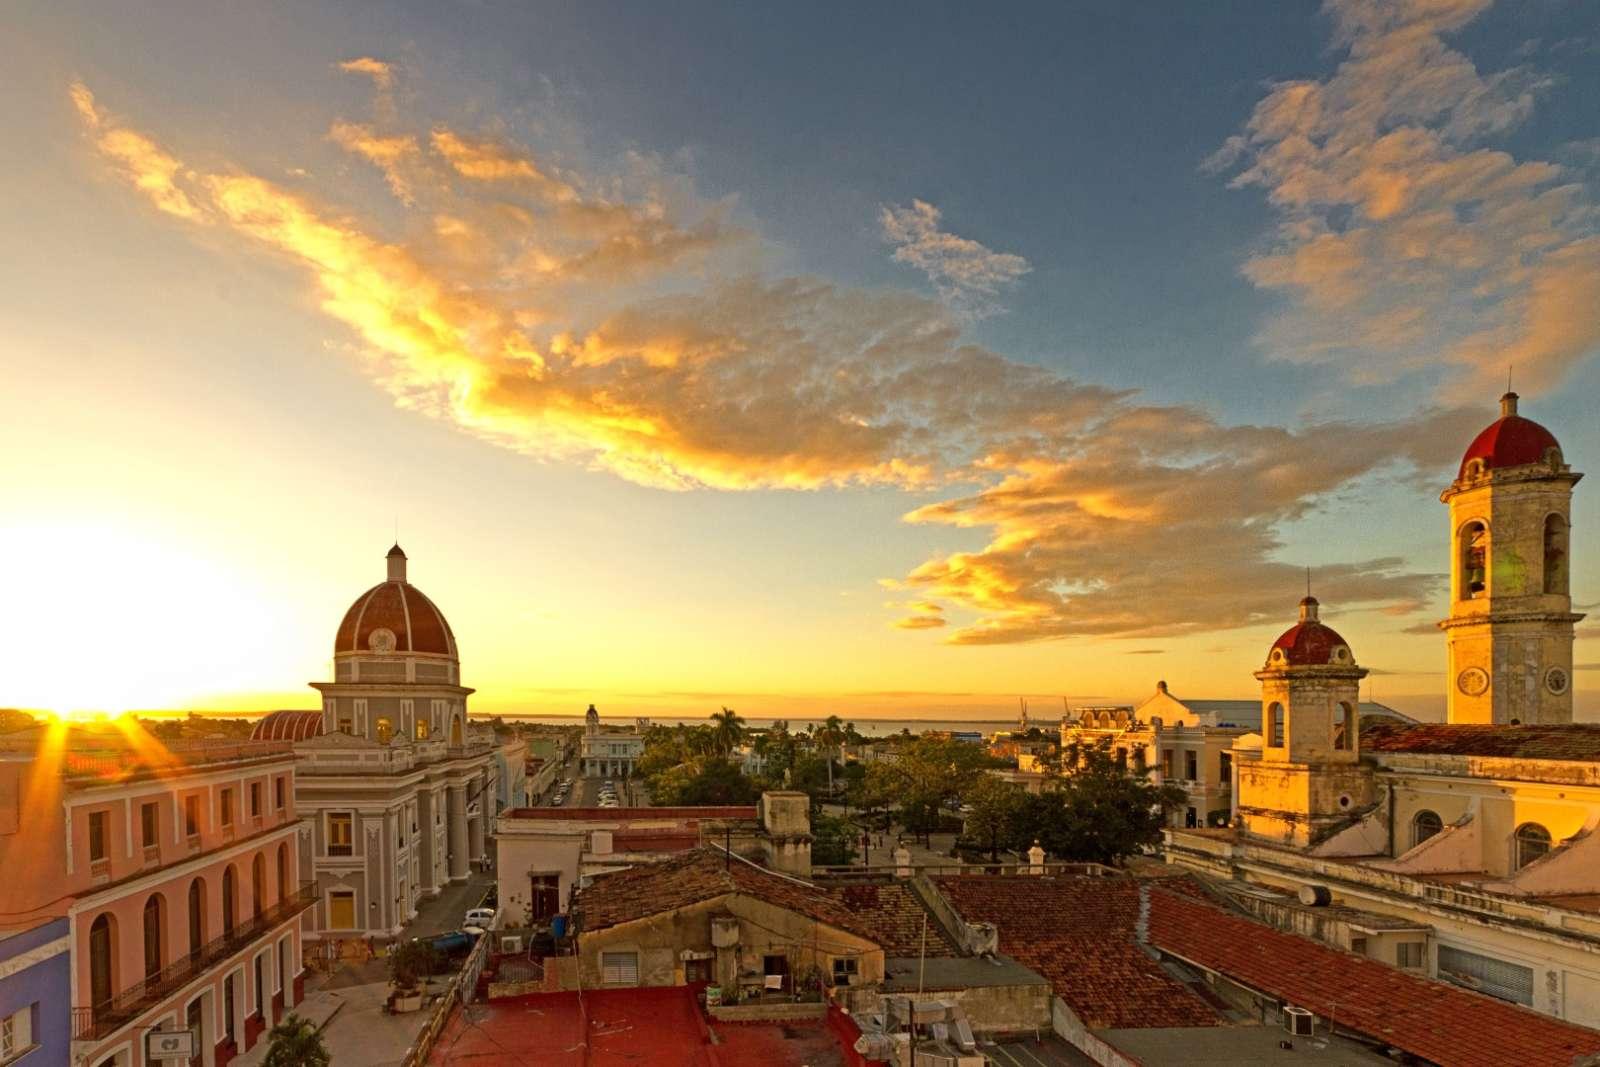 Sunset over Parque Central in Cienfuegos Cuba